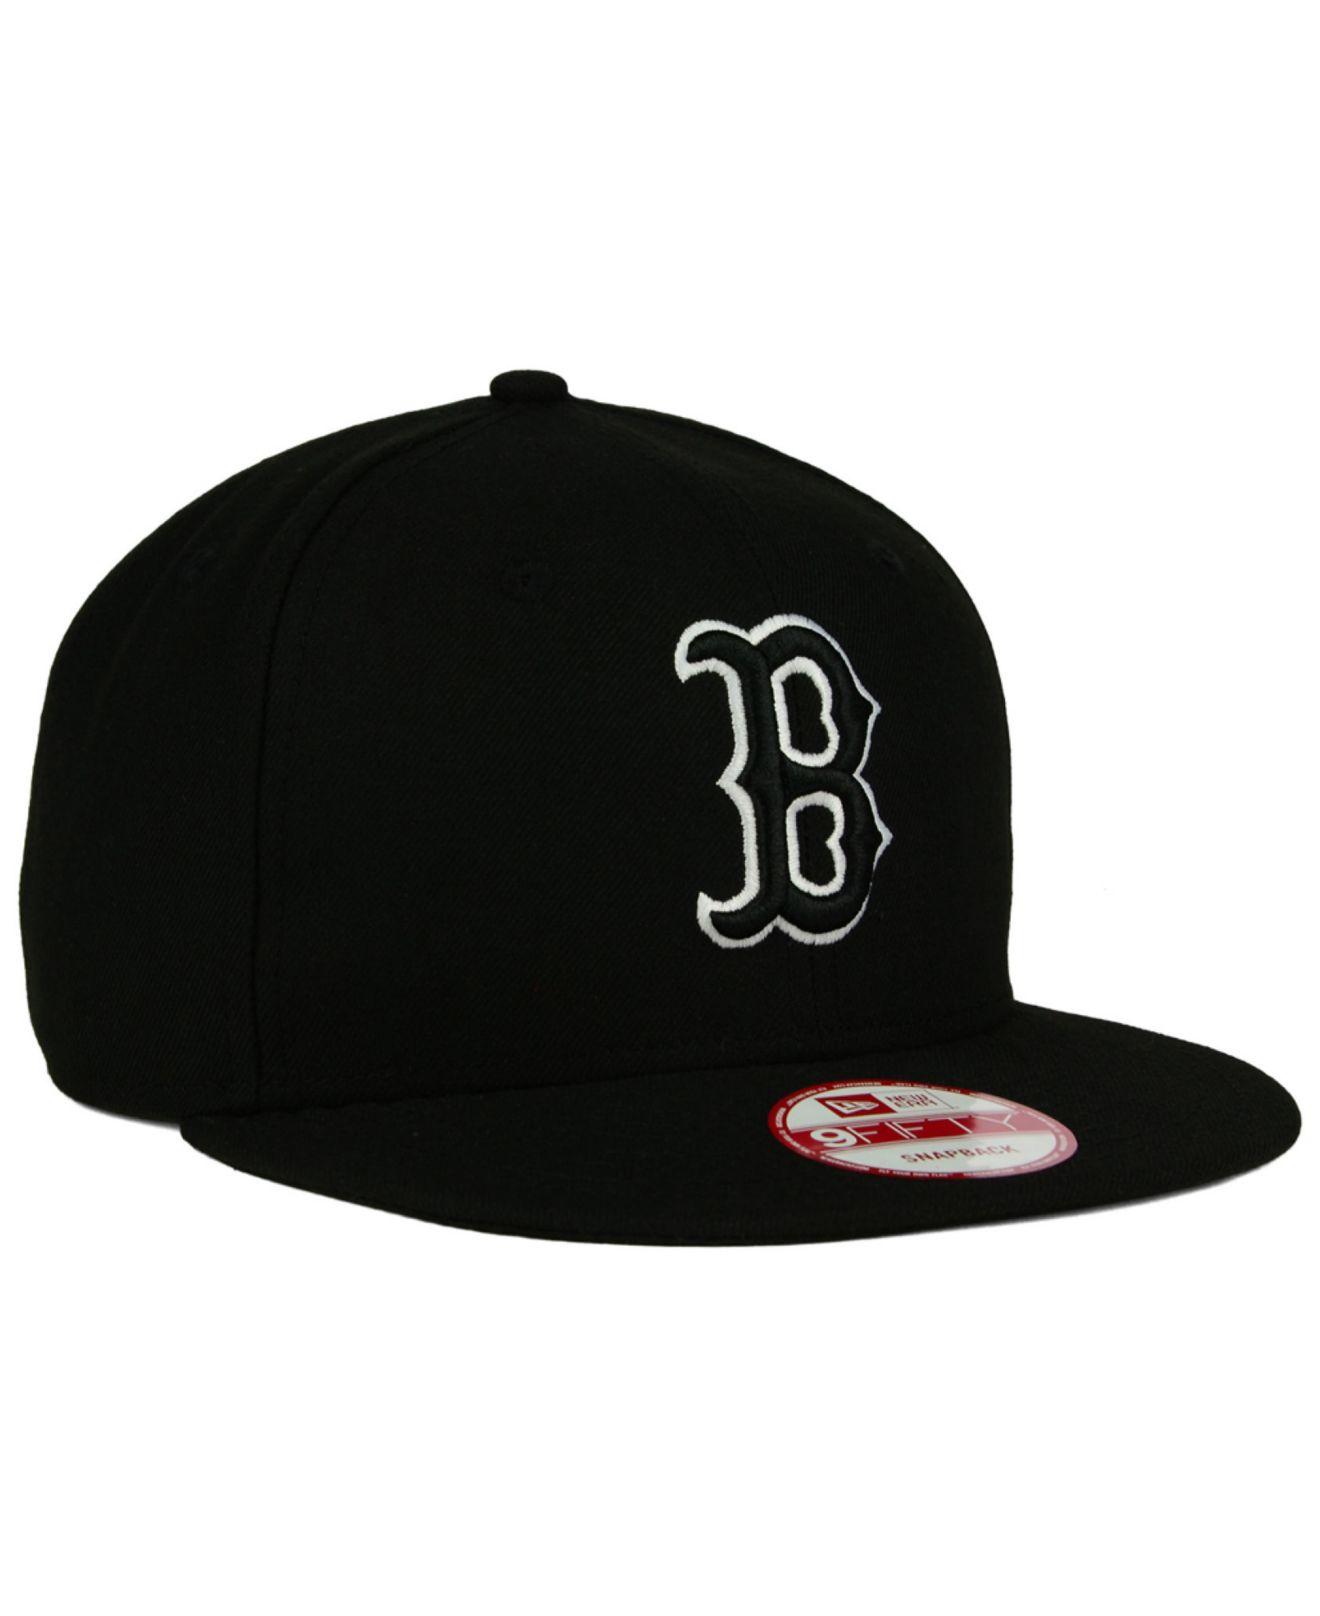 new concept 5d962 50e02 ... canada lyst ktz ucla bruins black white 9fifty snapback cap in black  for men d033c 91c08